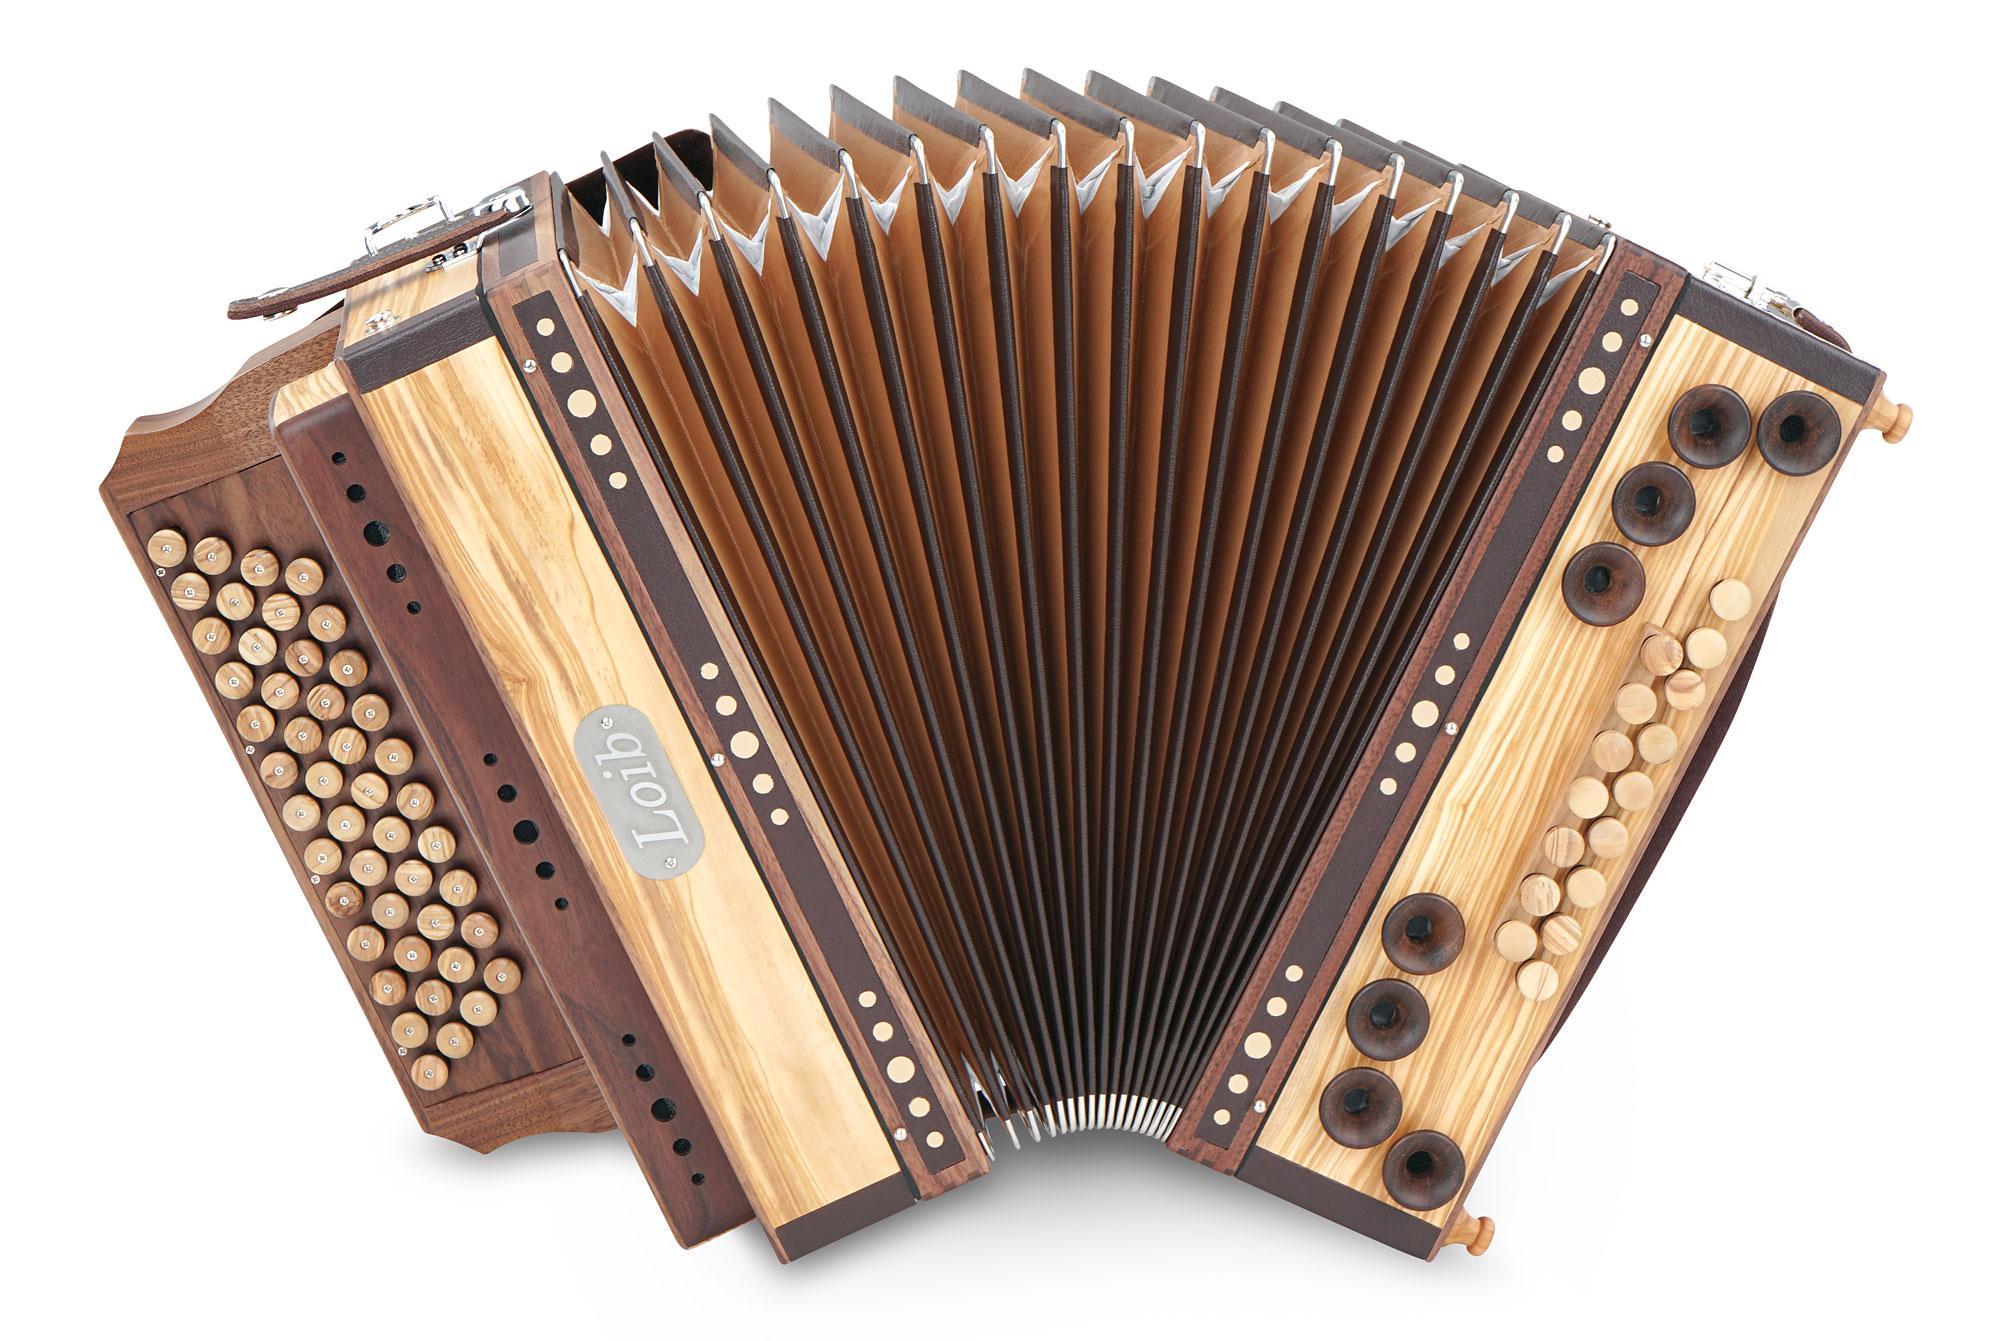 Loib Harmonika IVD Olive G C F B H Bass X Bass Holzverdeck